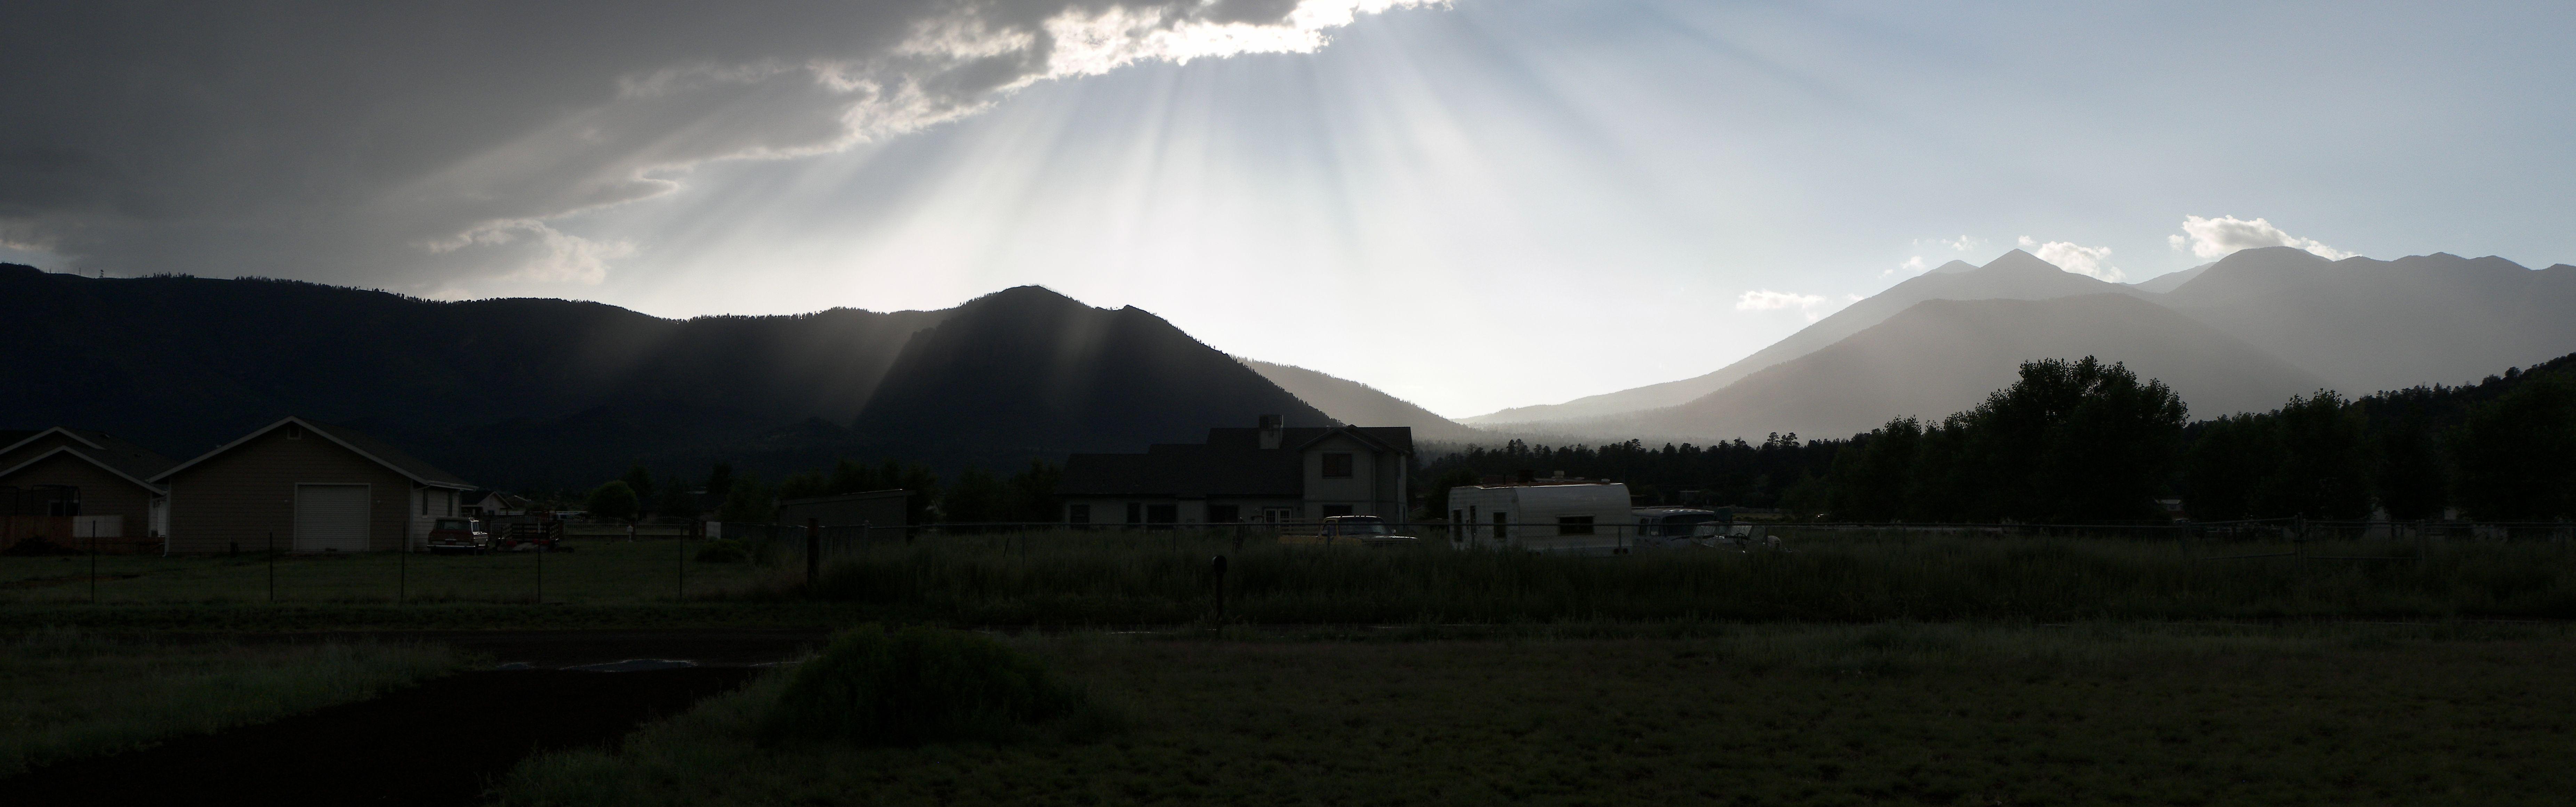 Rays of Sun, Arizona, Flagstaff, Mountains, Panorama, HQ Photo